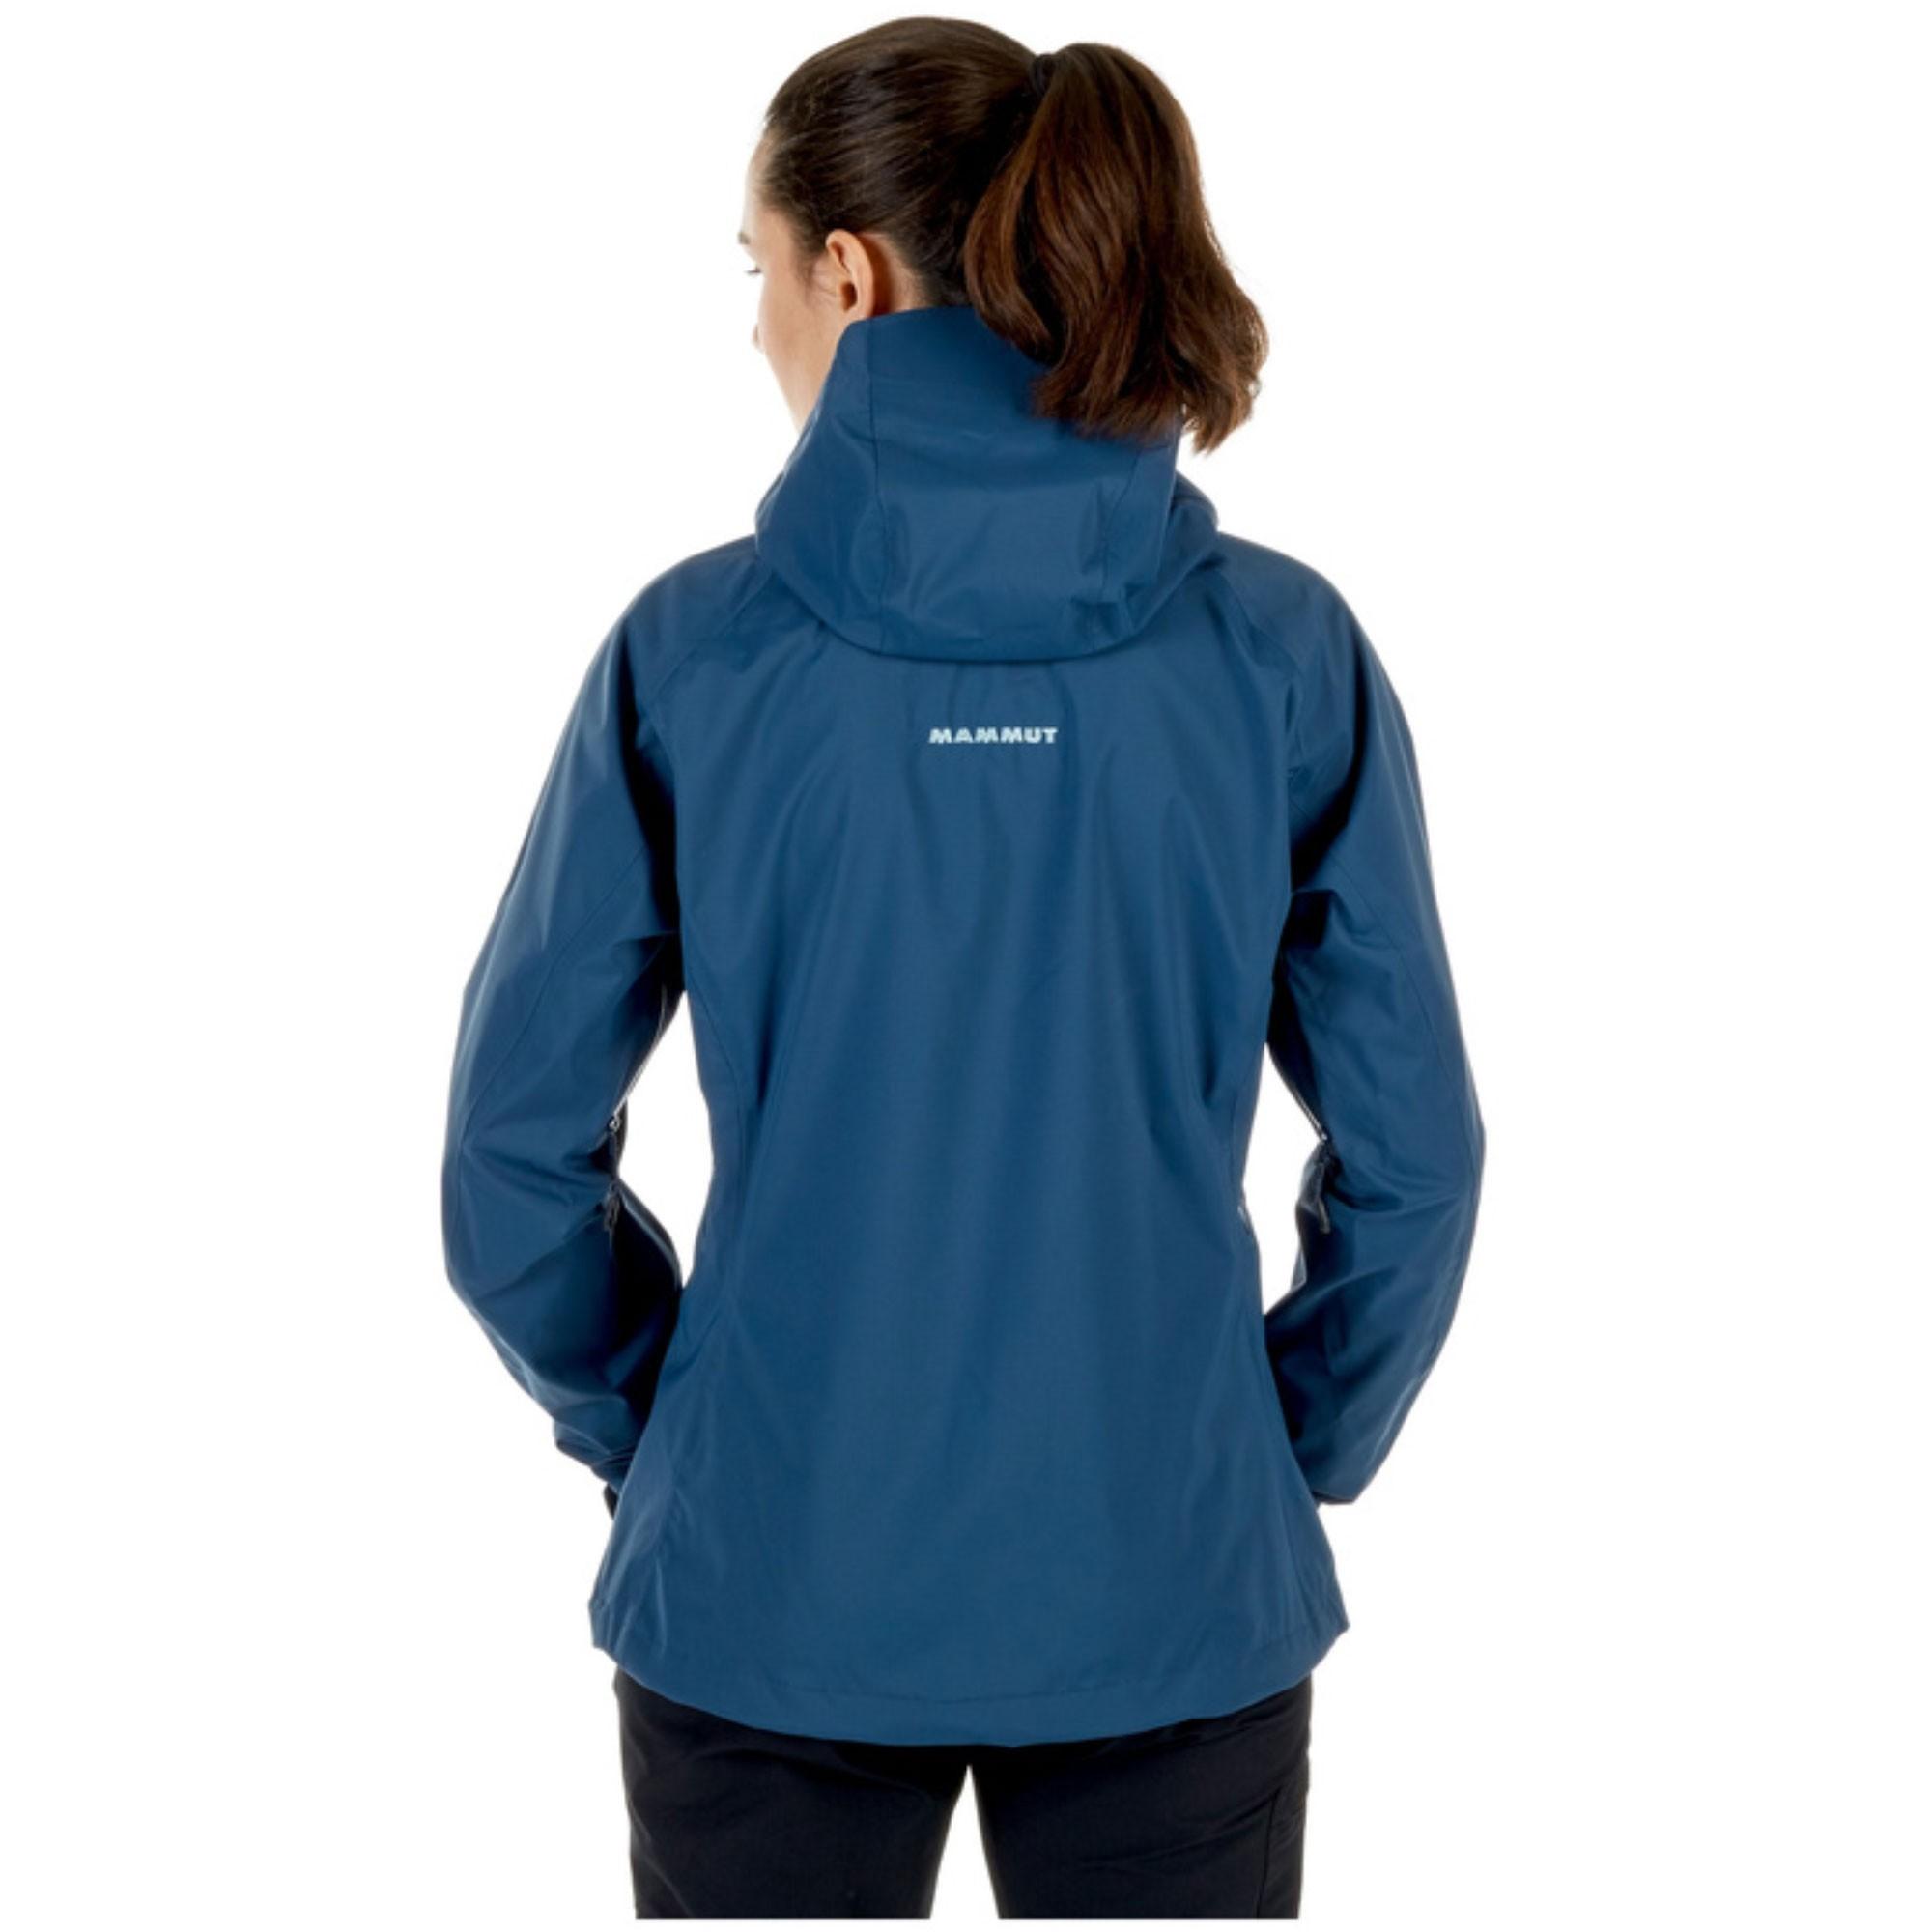 Mammut Keiko HS Women's Hooded Jacket - Jay